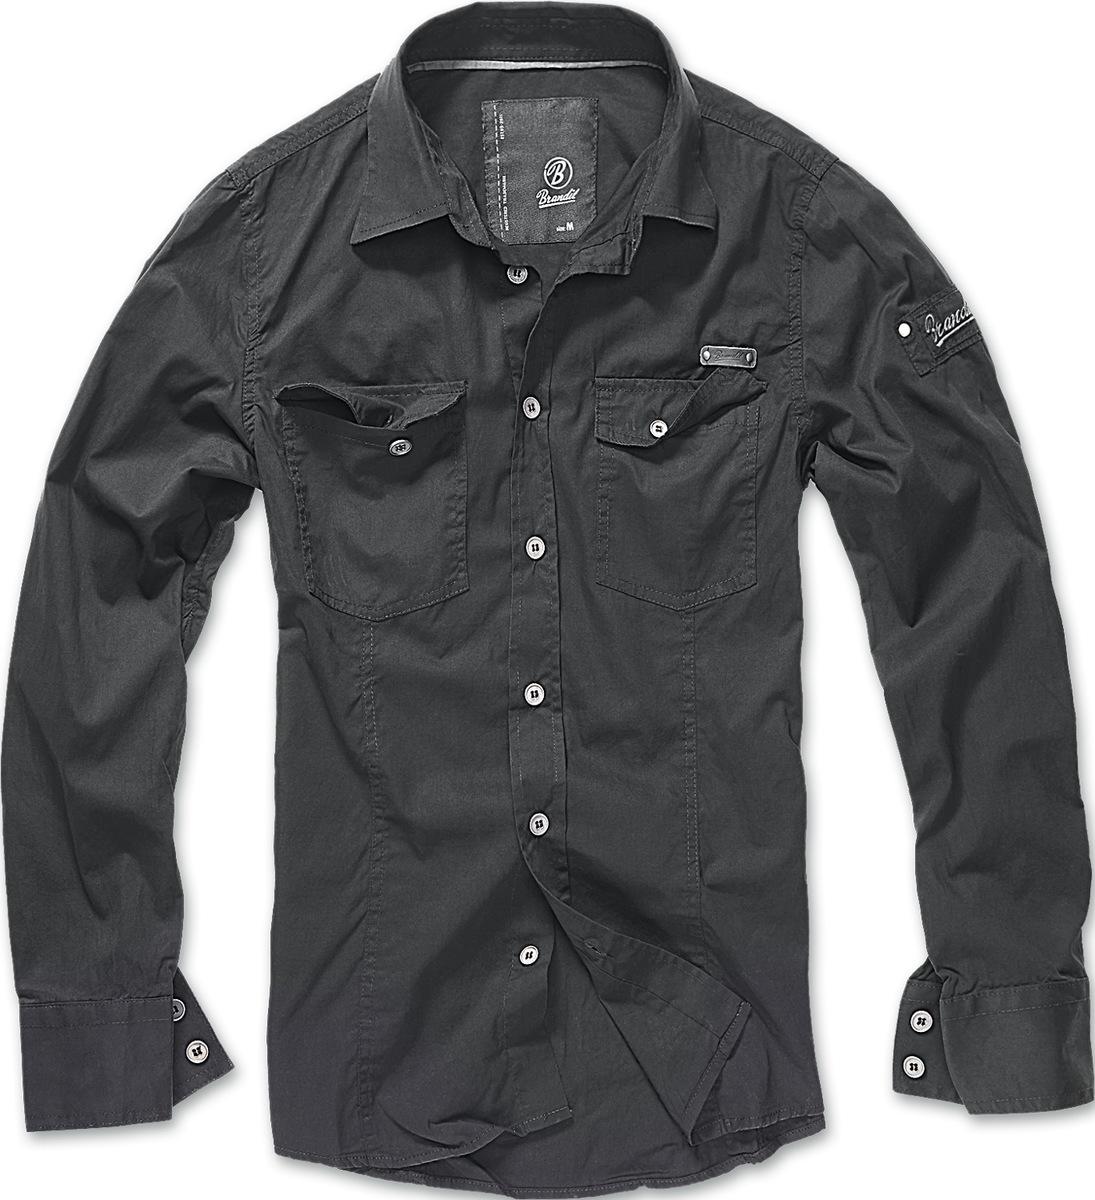 5290d83f4321 košele pánska Brandit - Men Shirt Slim - Black - 4005 2